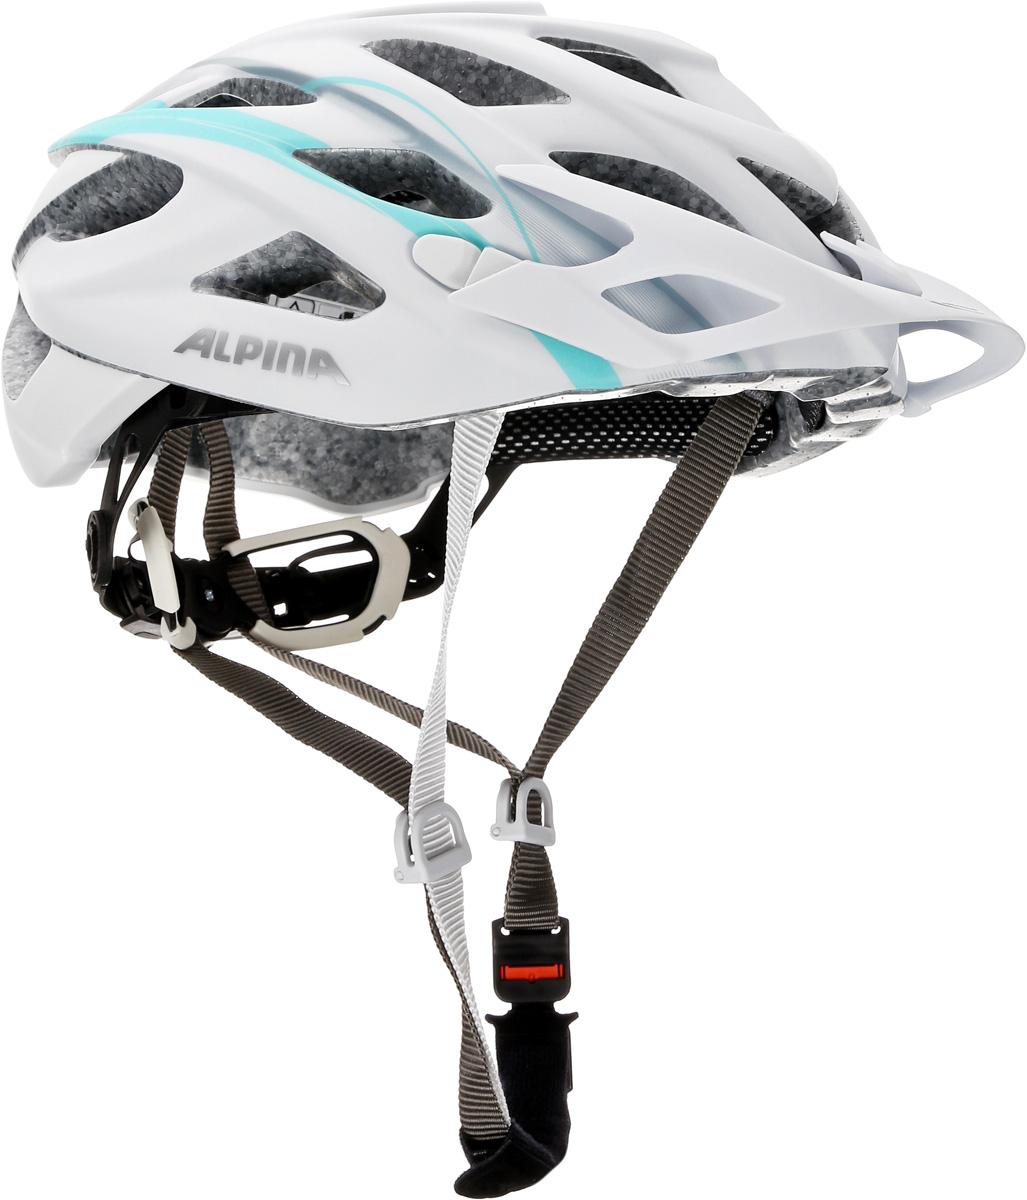 Велошлем Alpina D-Alto LE, цвет: белый, зеленый. Размер 52-57 см moog k9153 lower ball joint